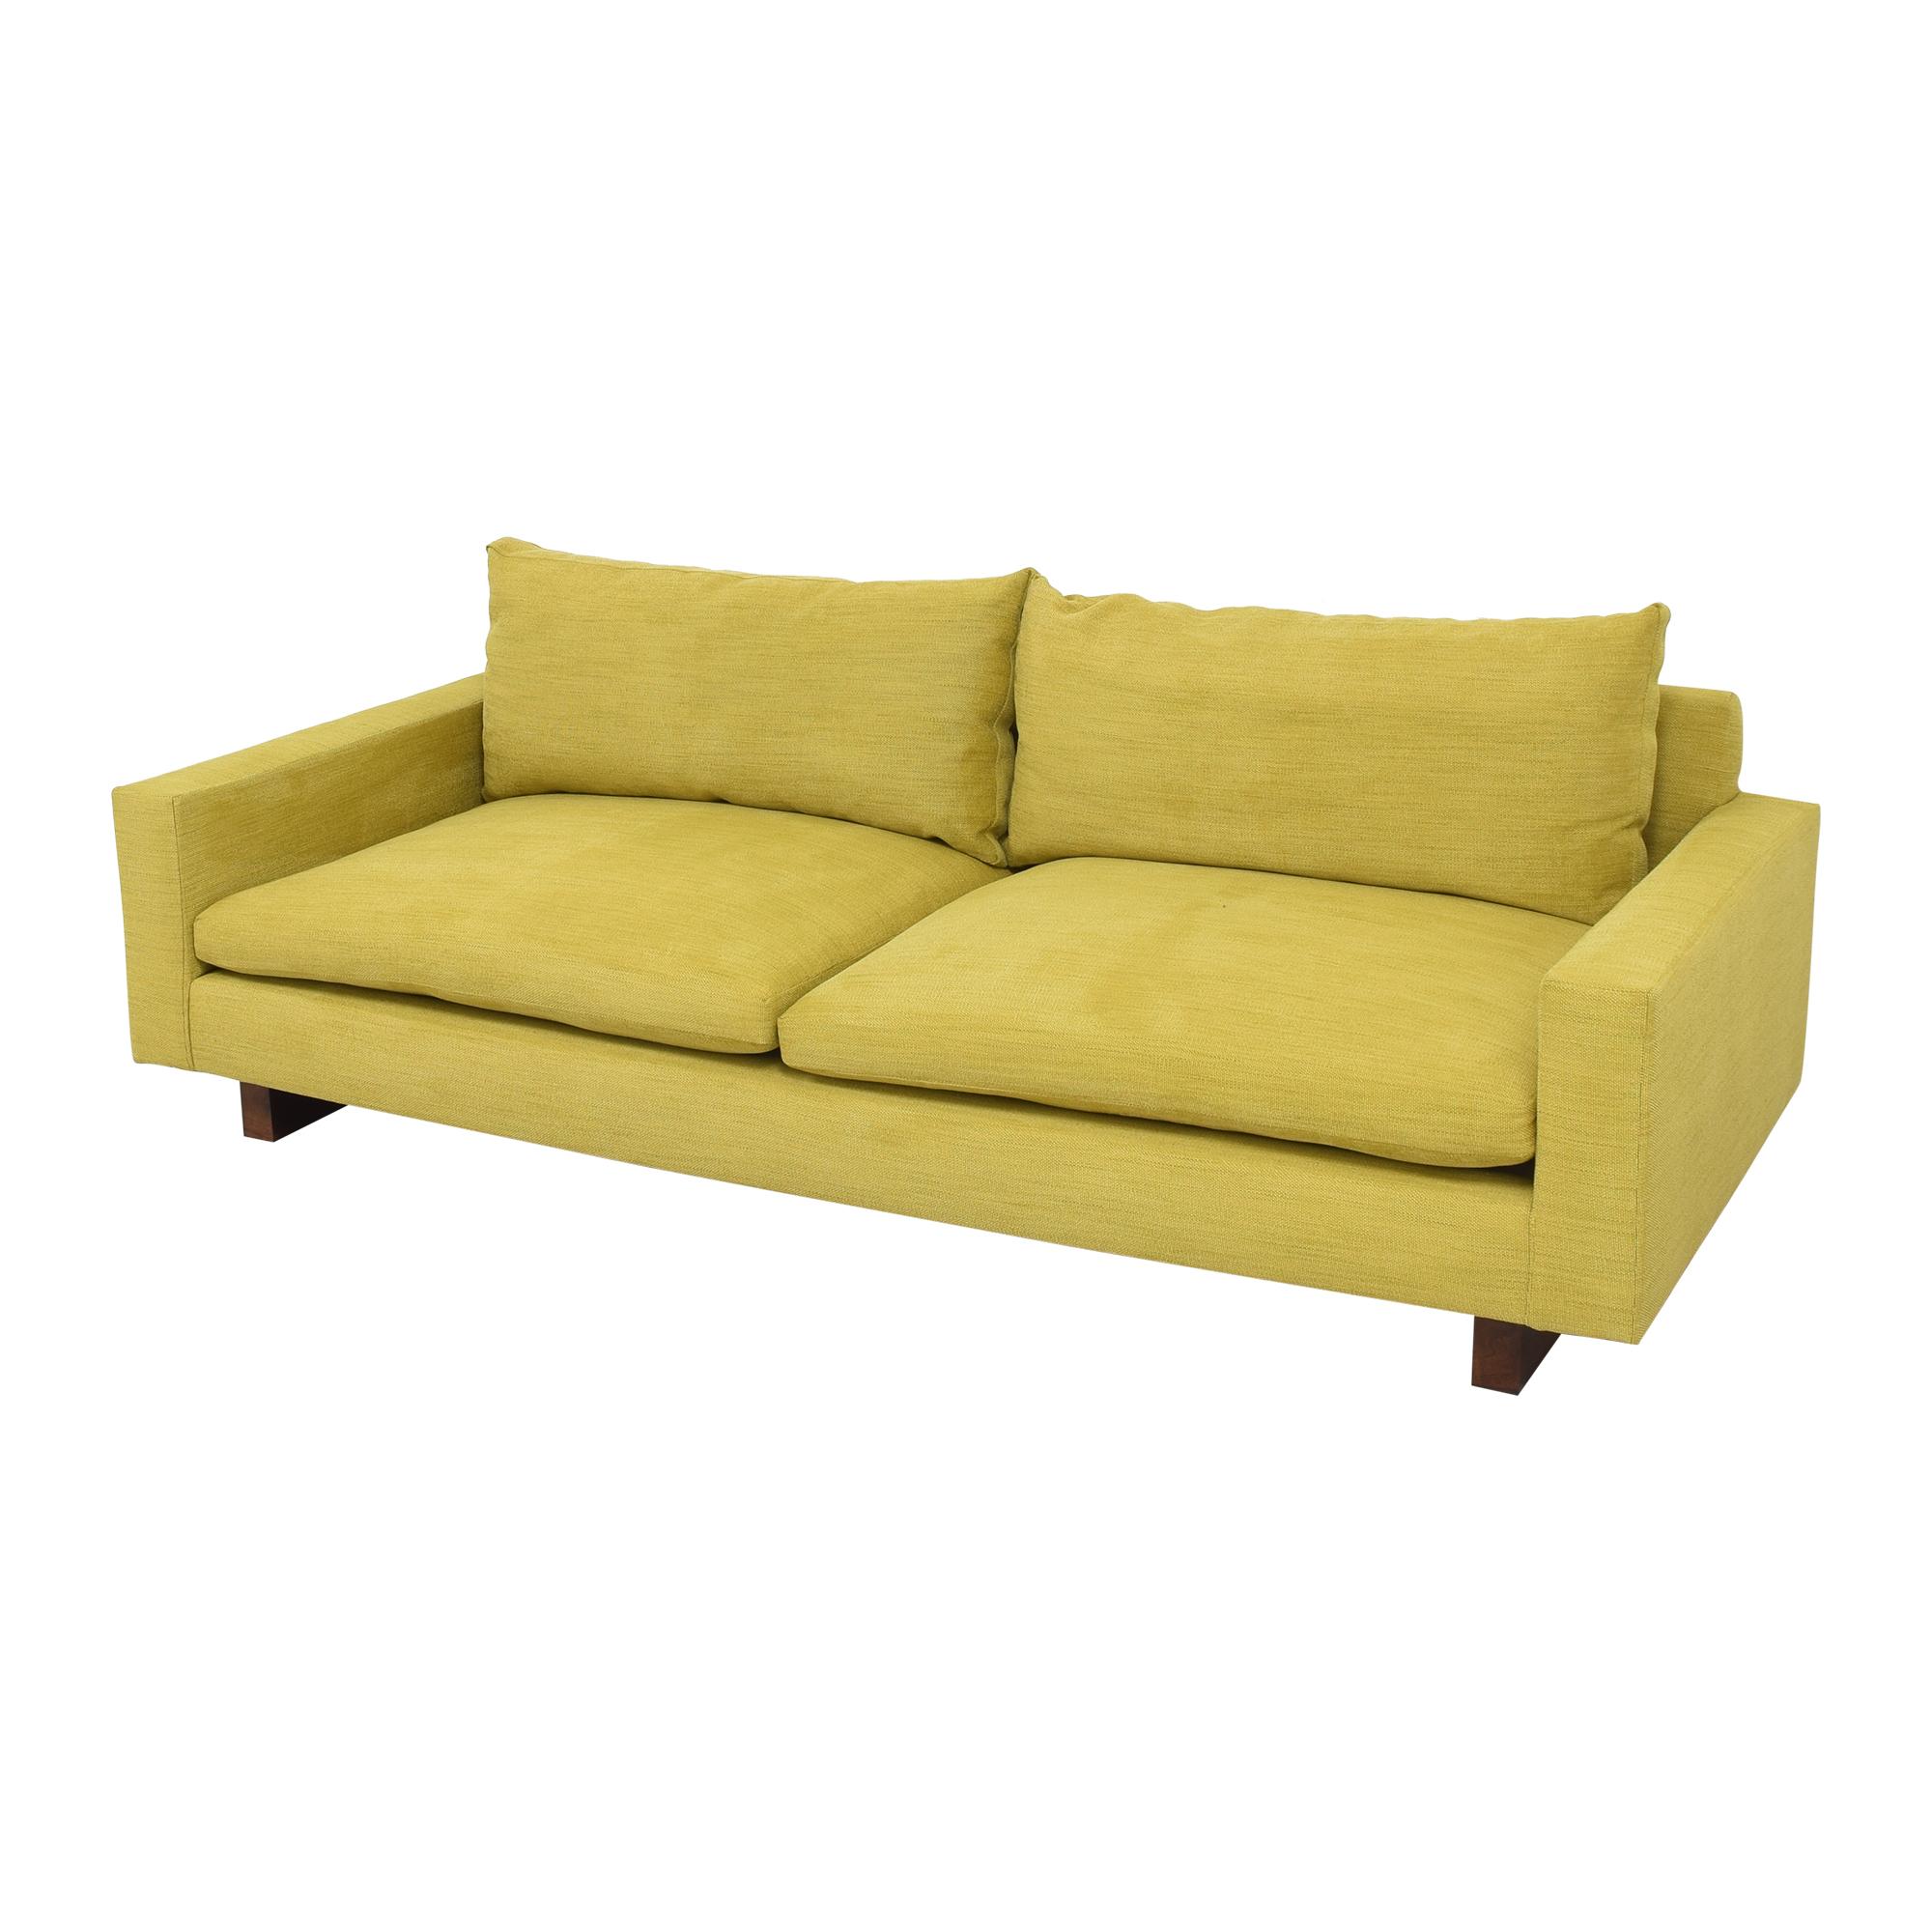 West Elm West Elm Harmony Two Cushion Sofa dimensions